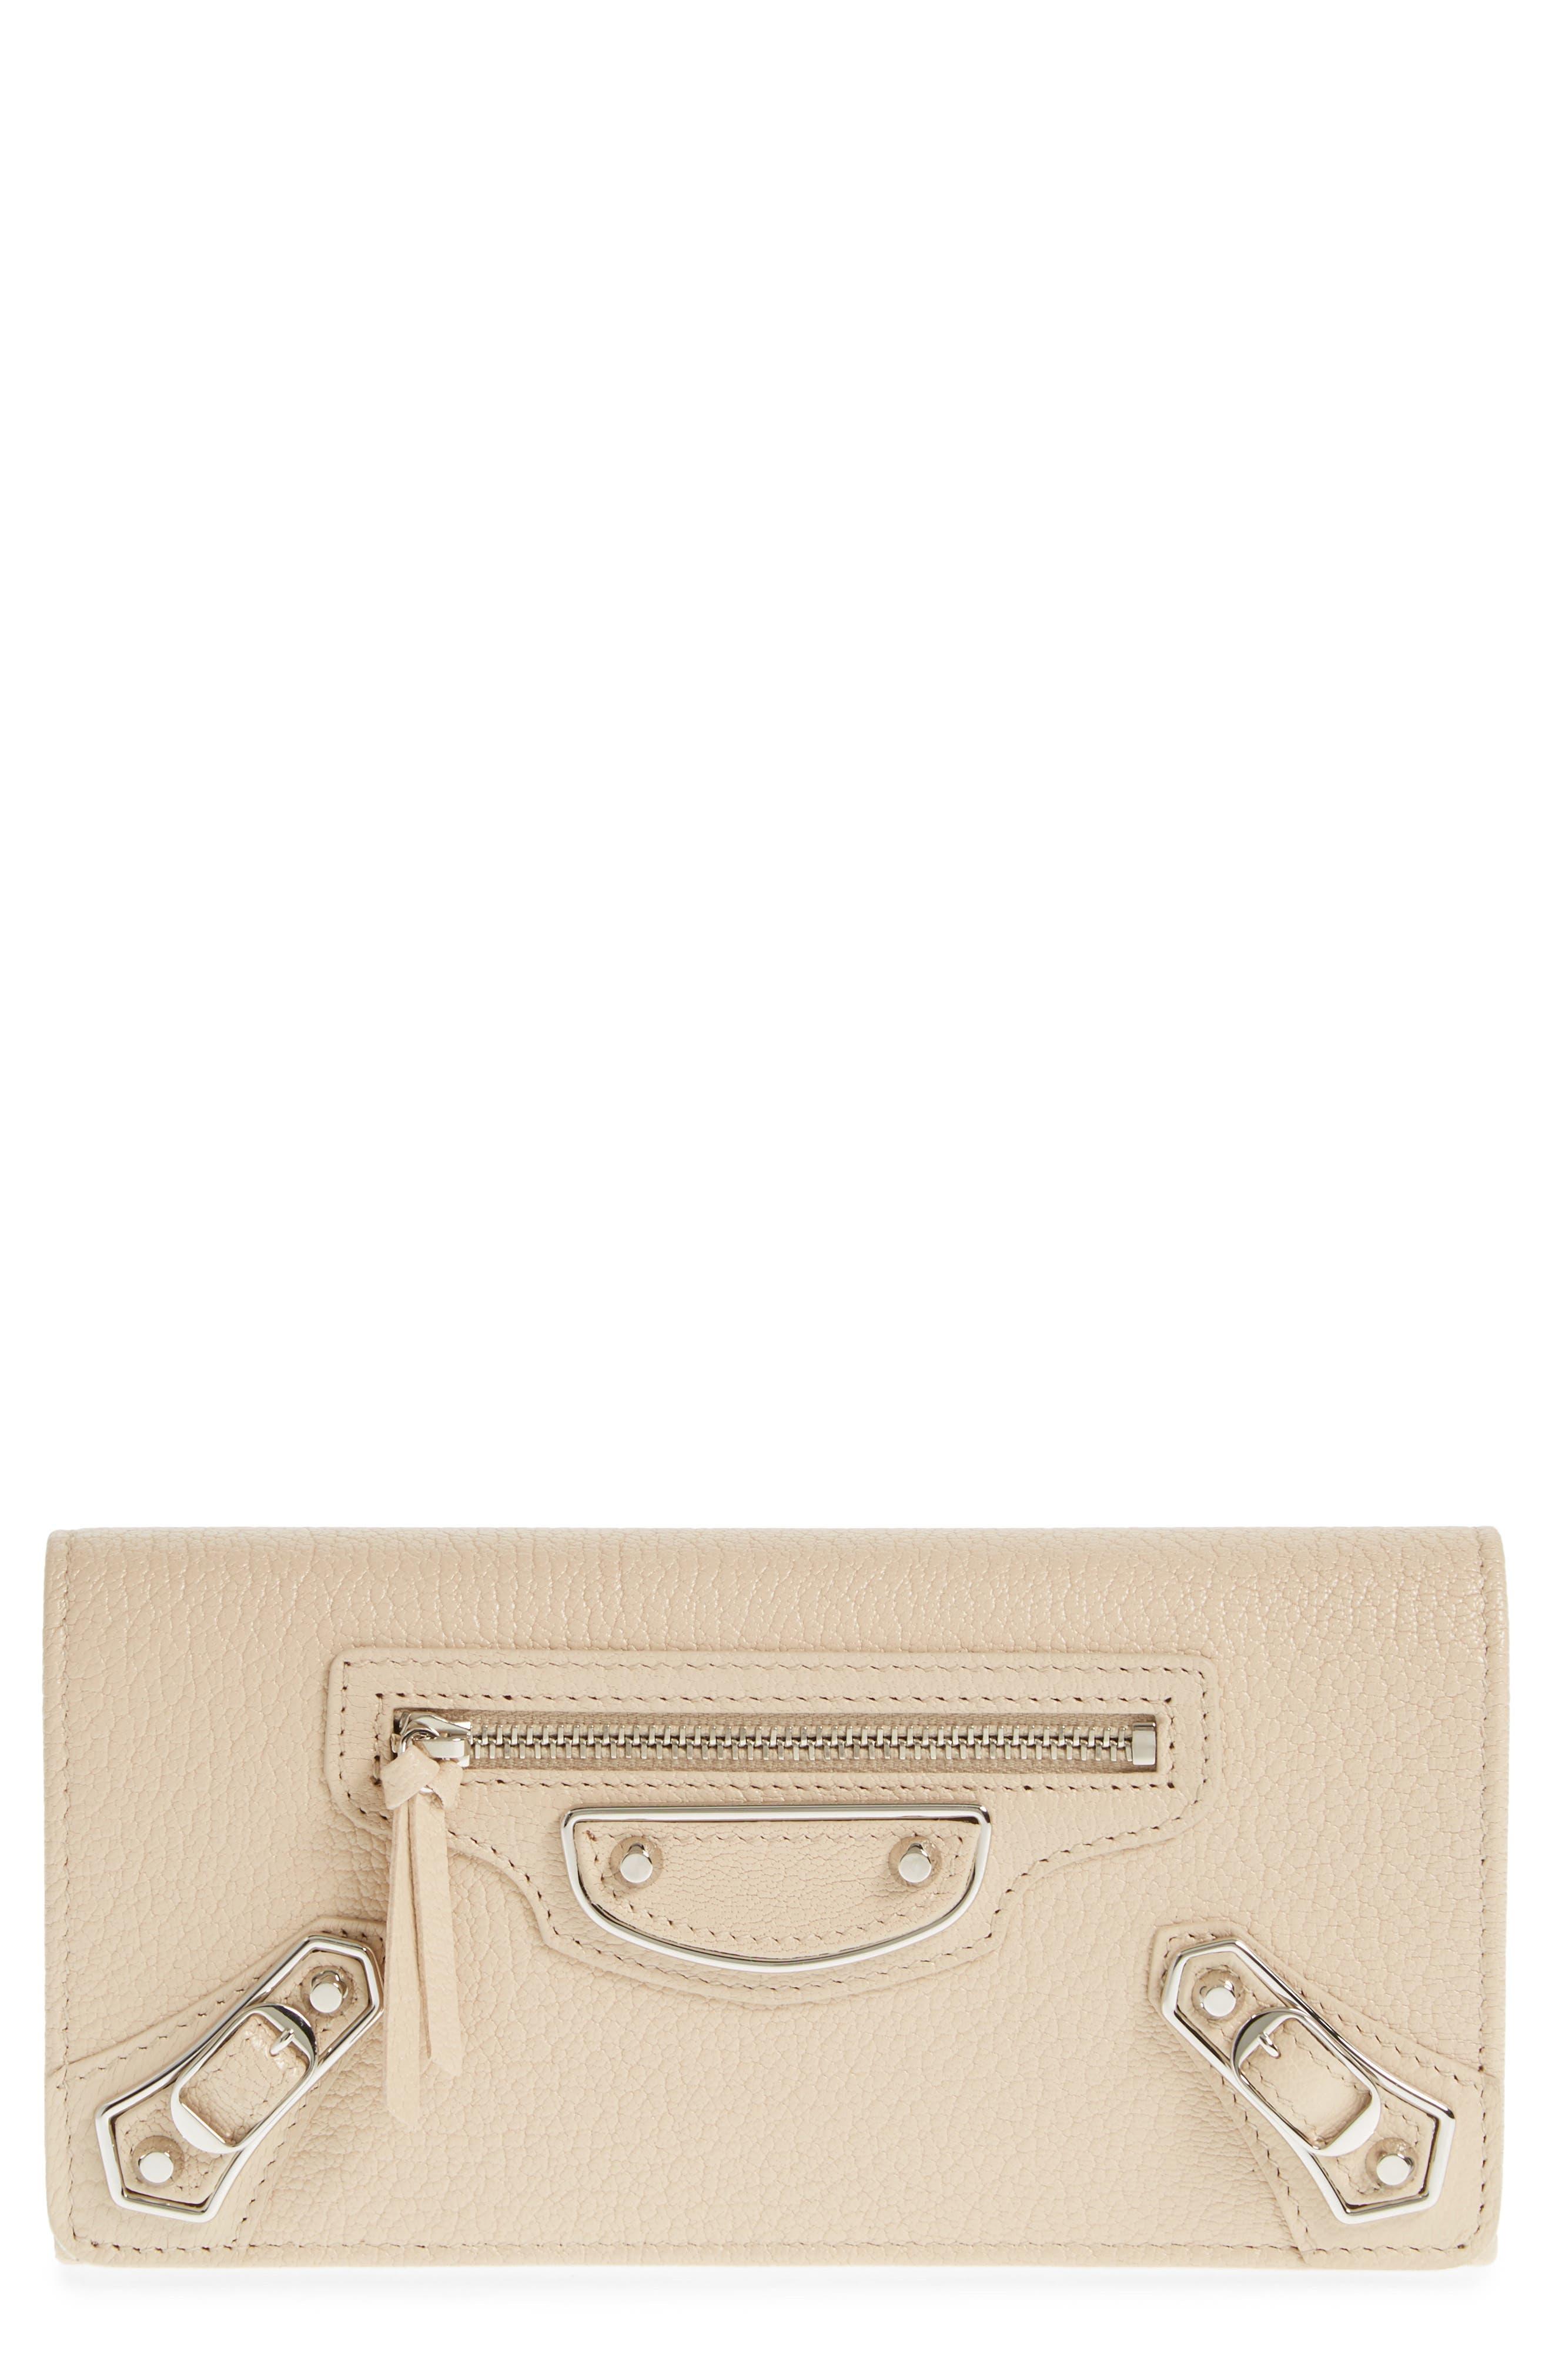 Main Image - Balenciaga Metallic Edge Money Leather Wallet